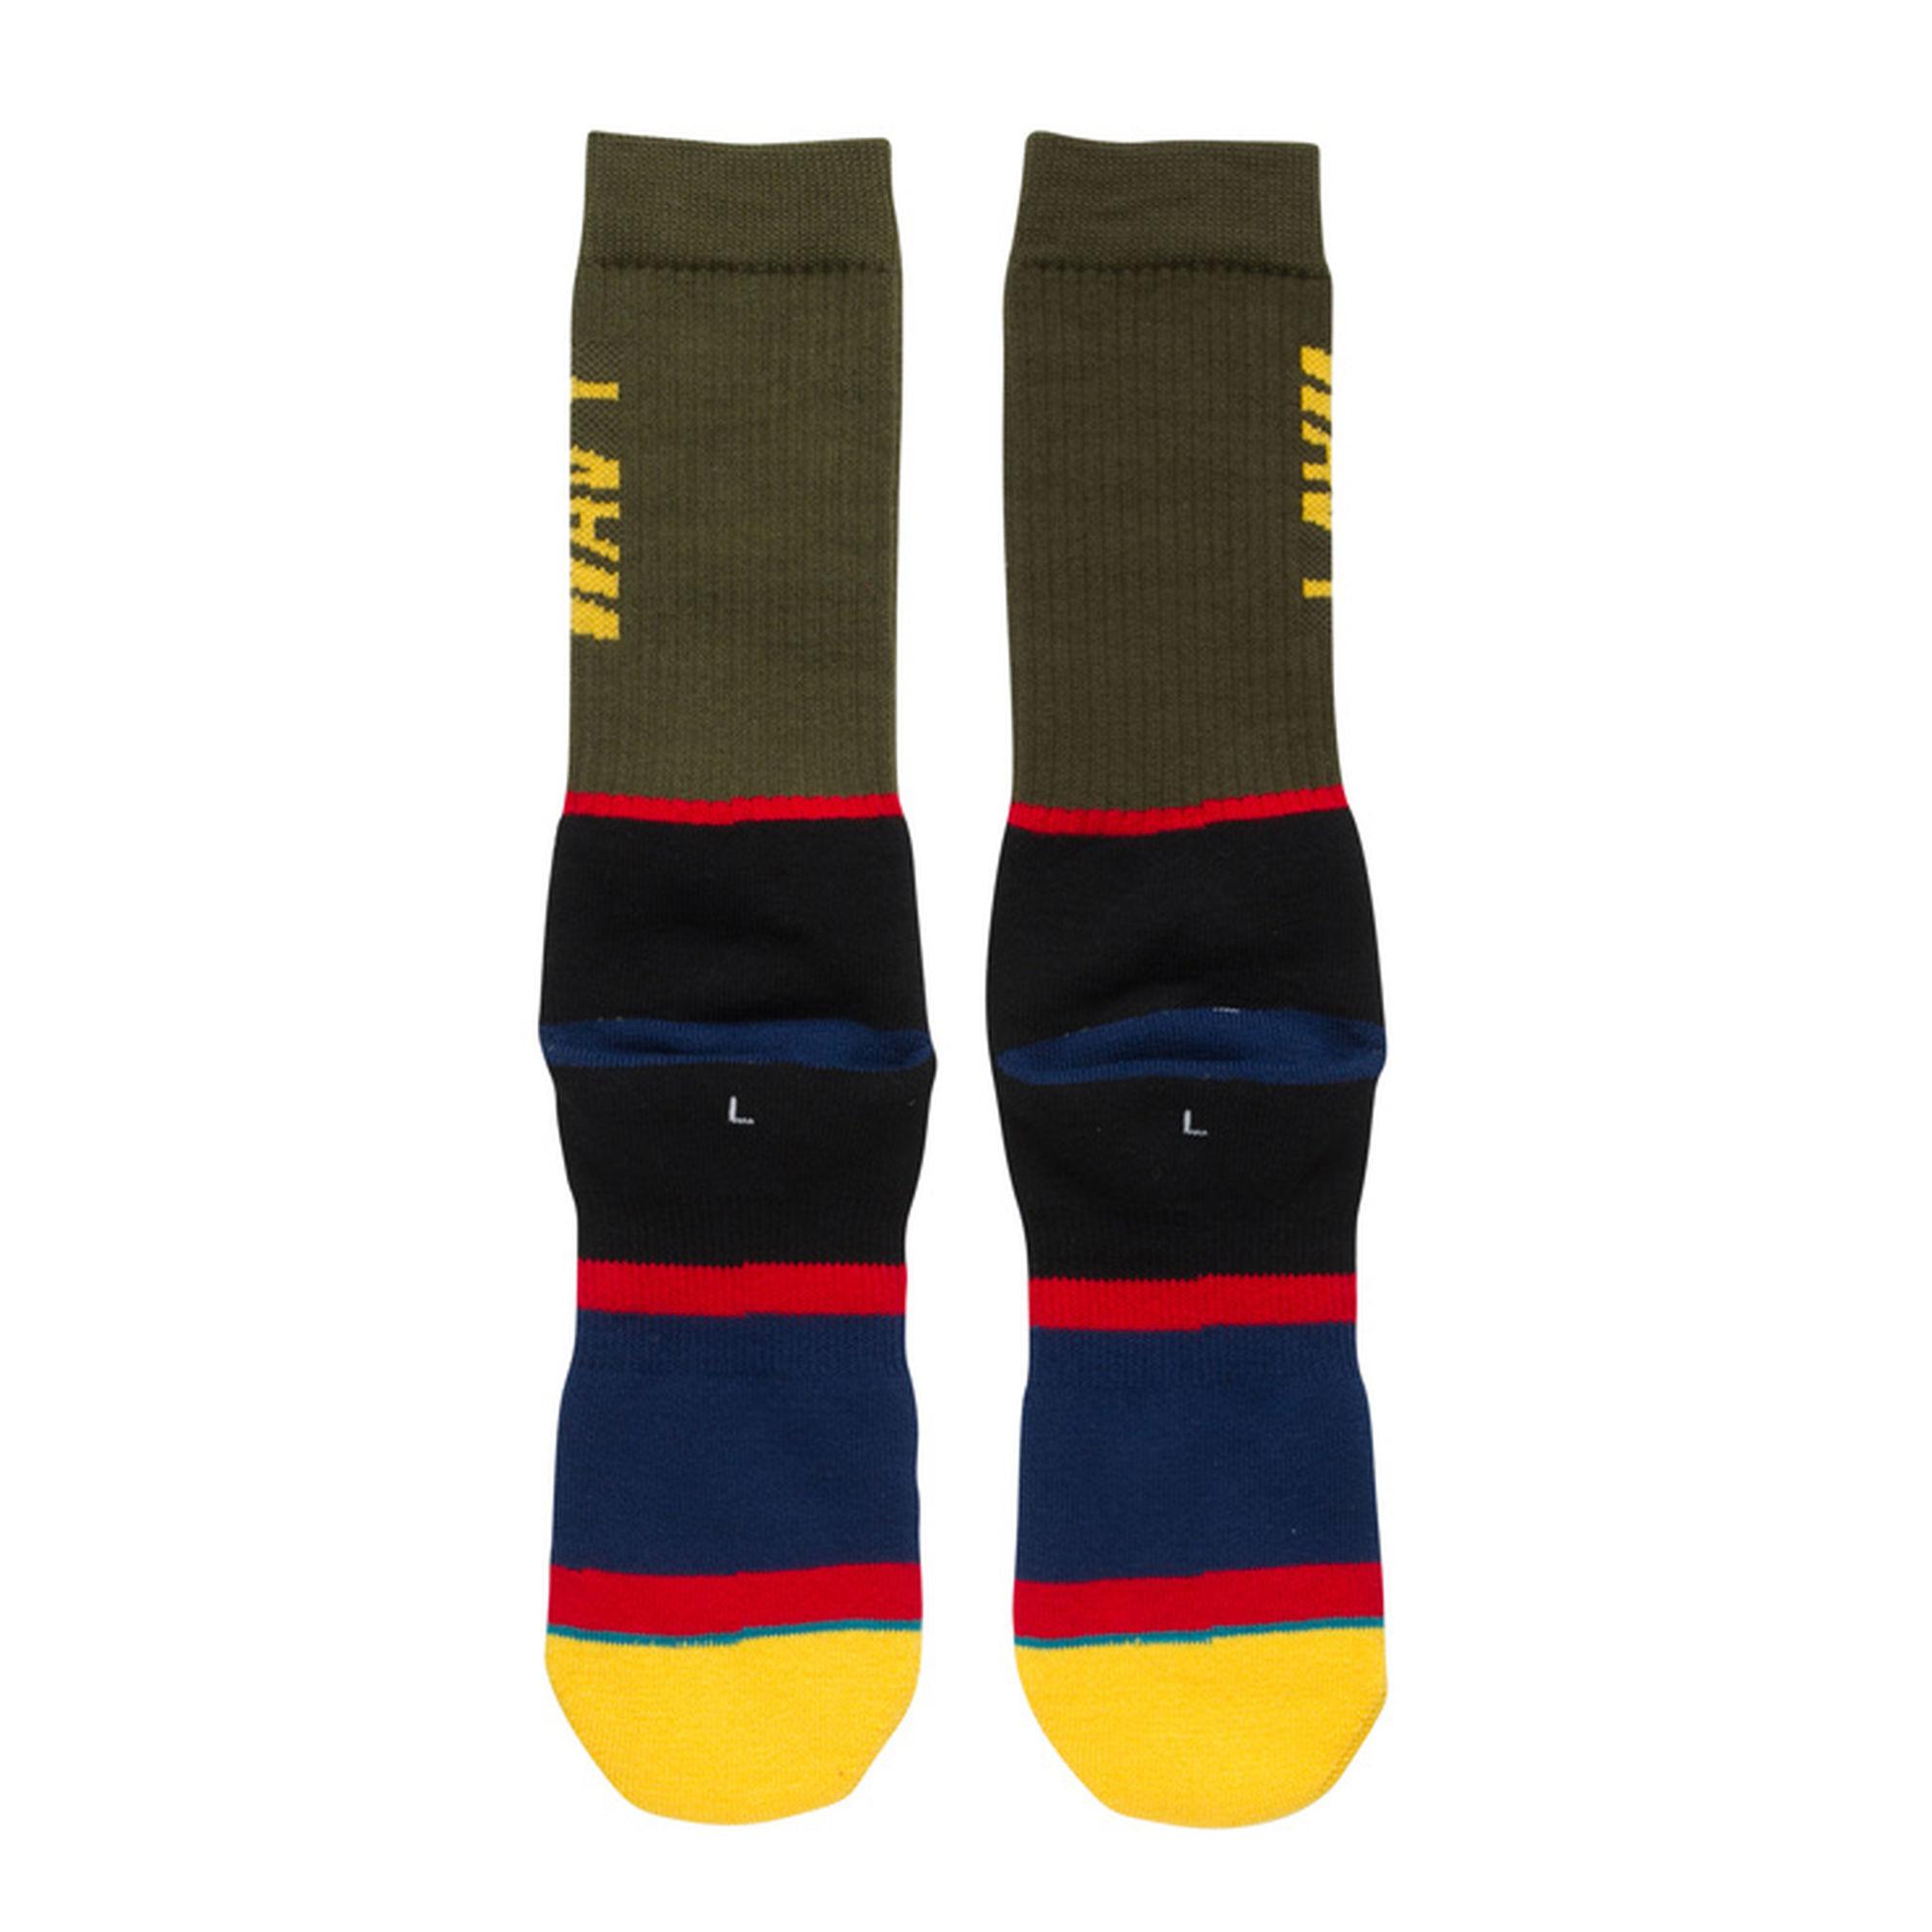 WAVY STANCE SOCKS スタンスソックス 日本 取扱店 ブランド メンズ 靴下 通販